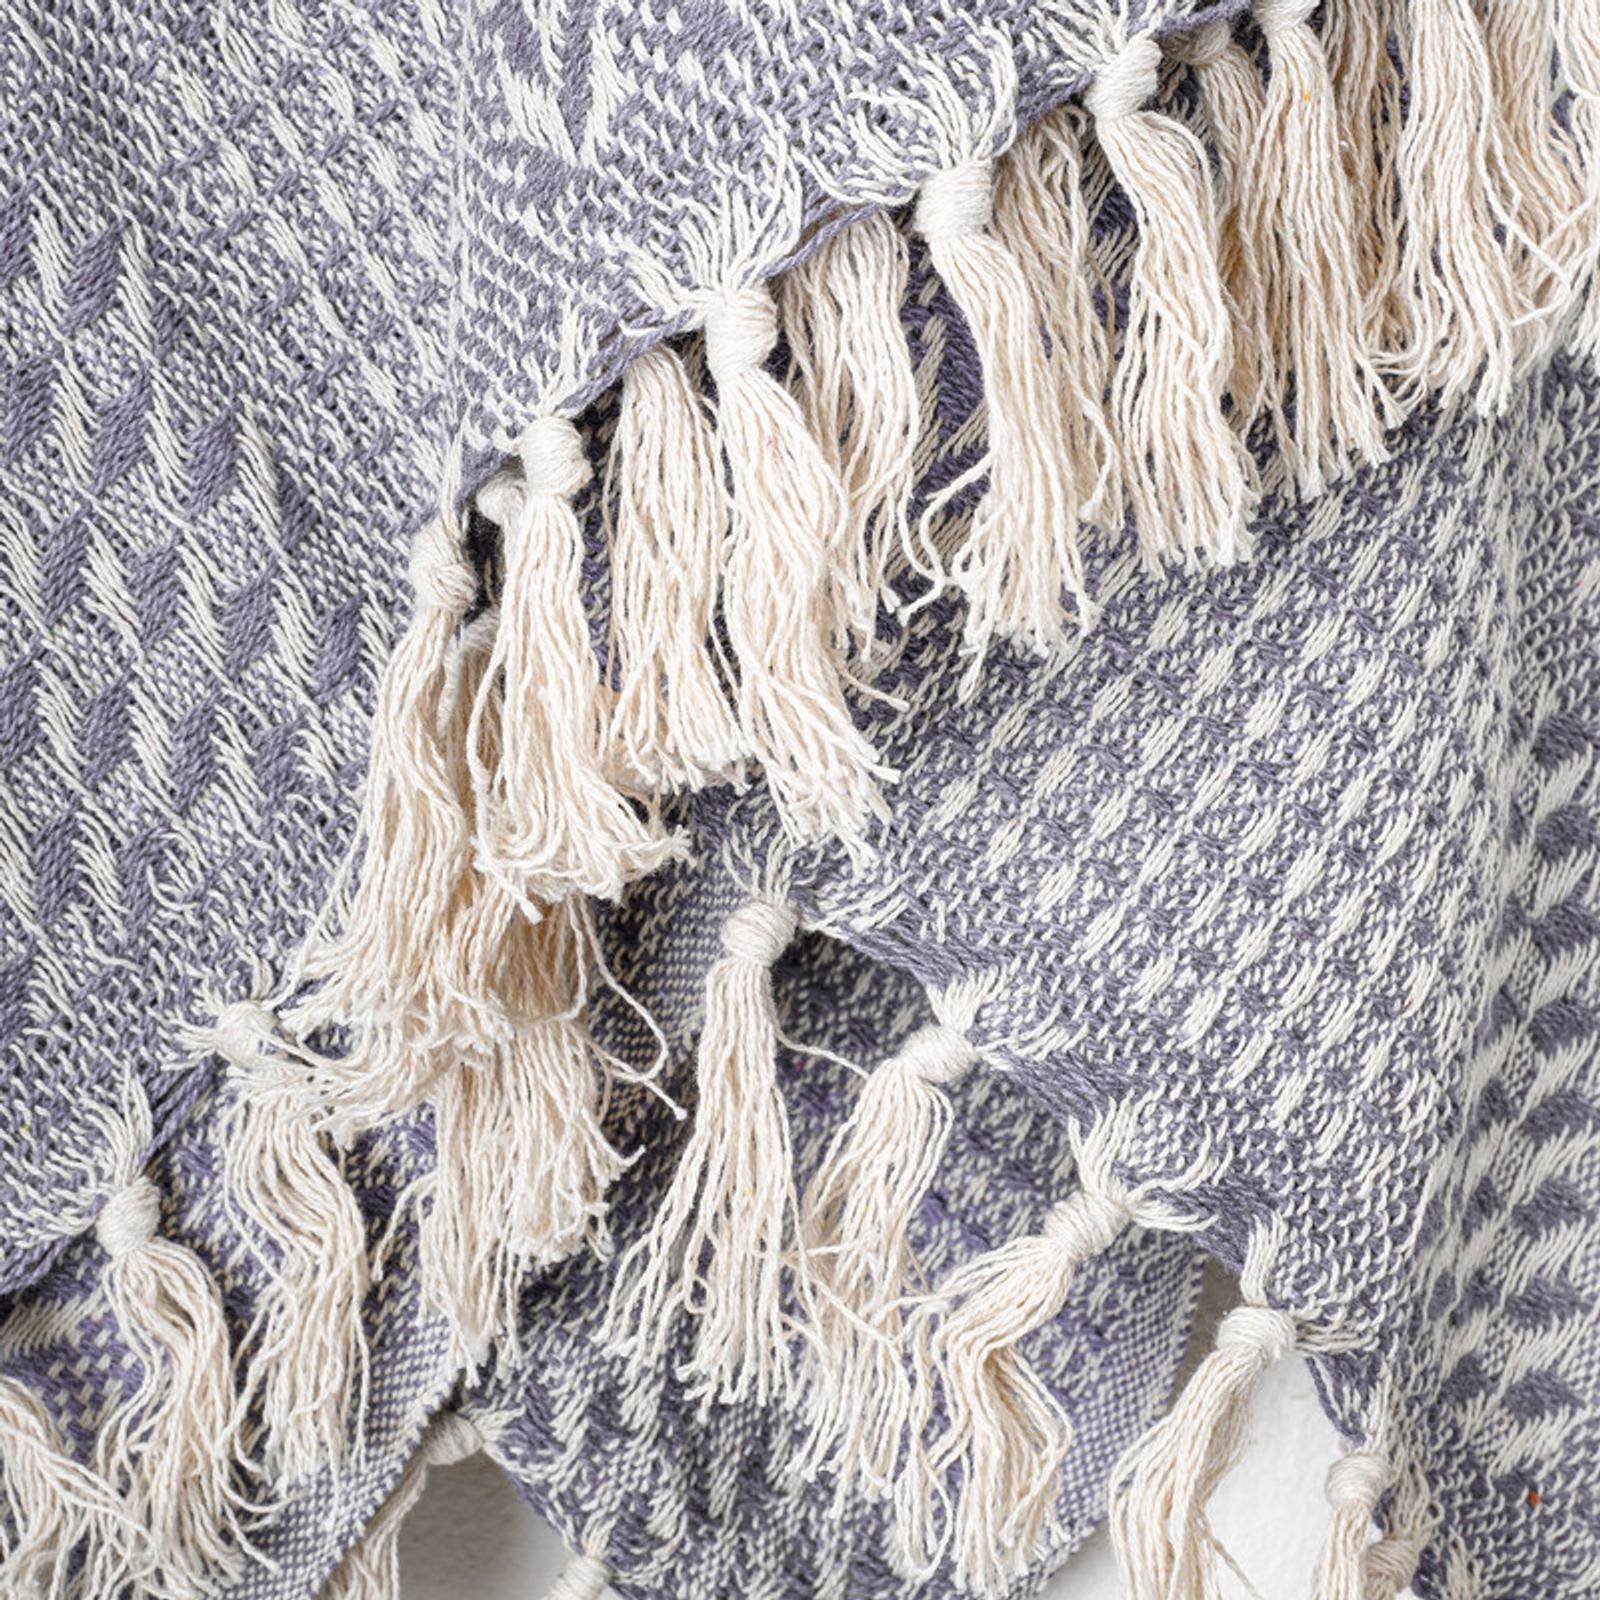 La'Grace 100% Cotton Handloom Herringbone Weave Cotton Throws - Natural 150 x 125 cm